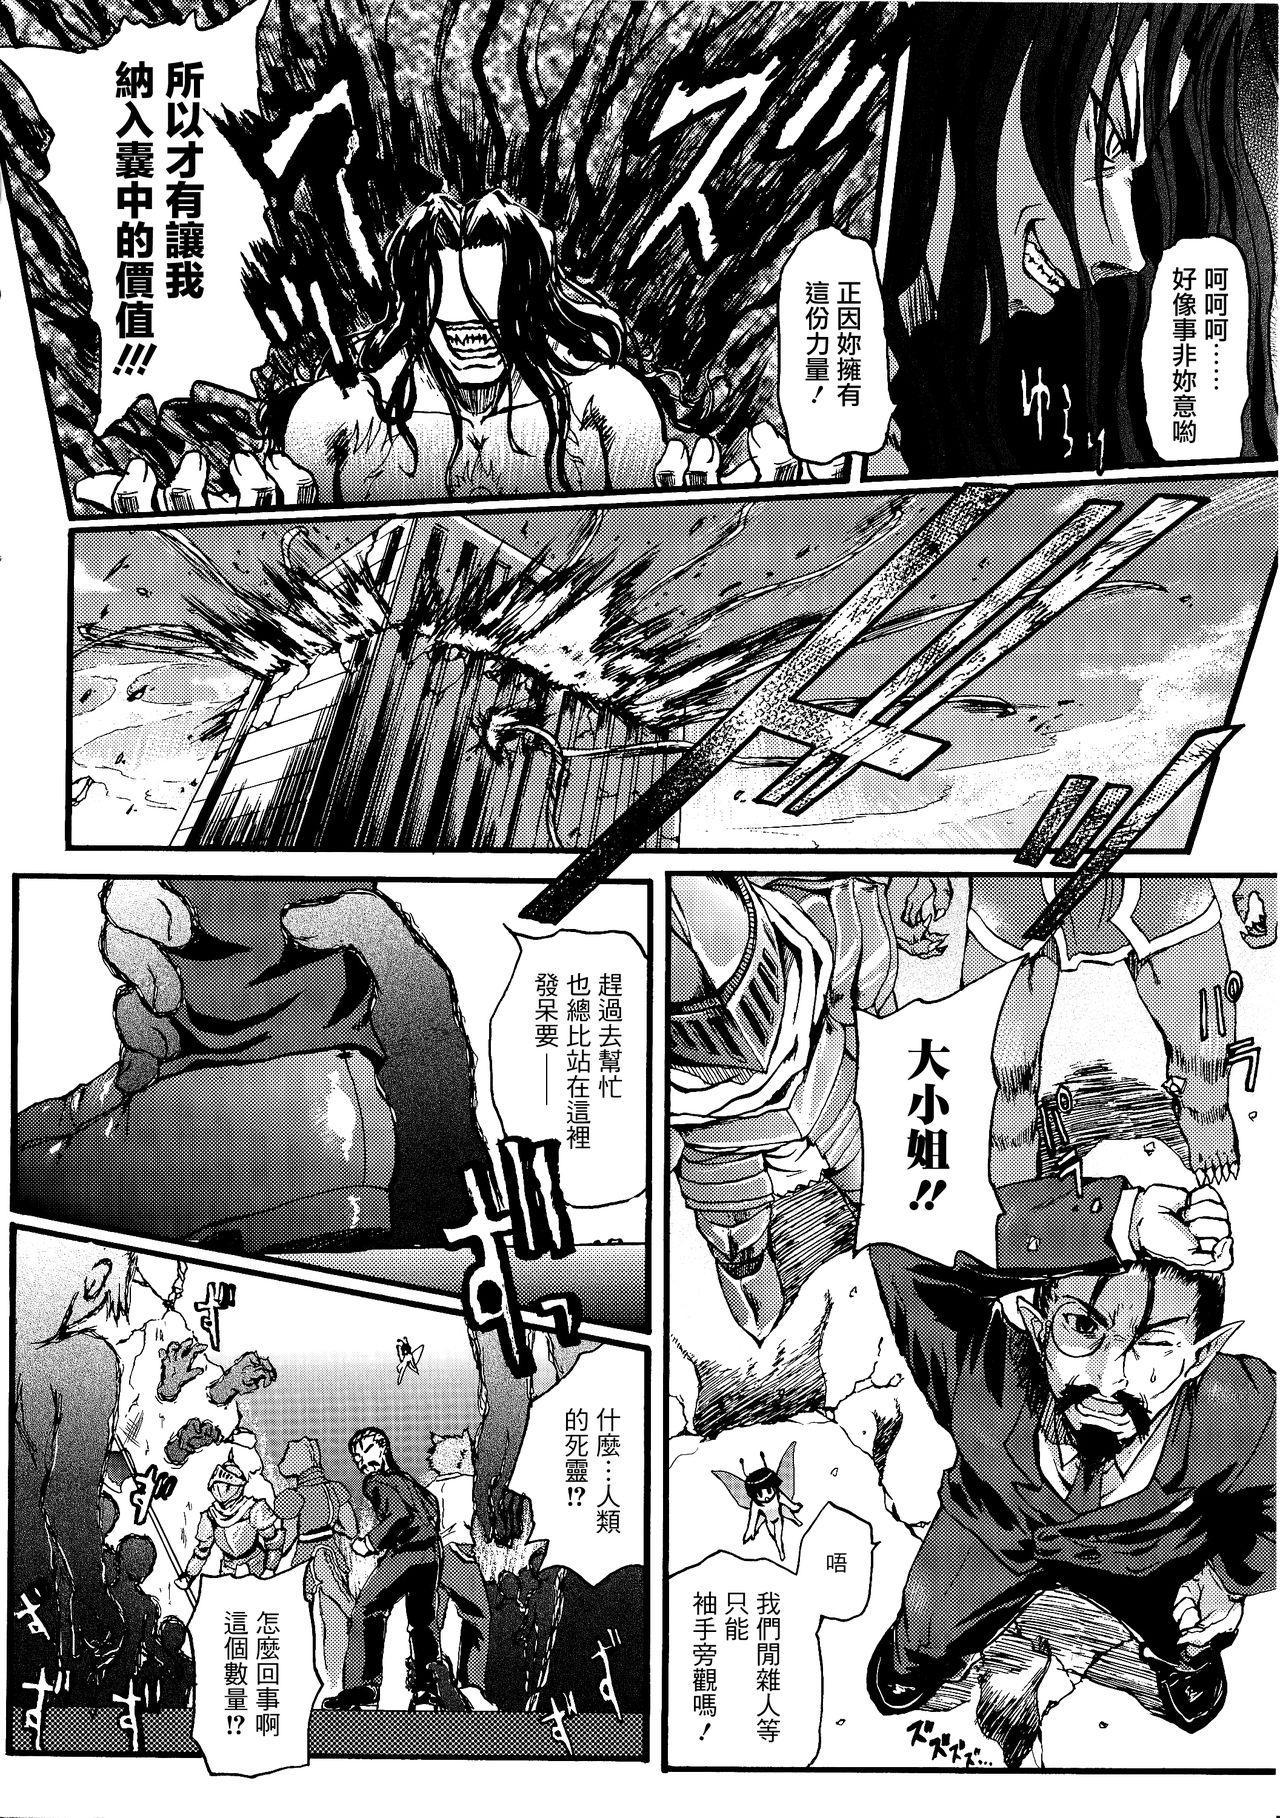 Ma ga Ochiru Yoru Demonic Imitator CH.1-7 18